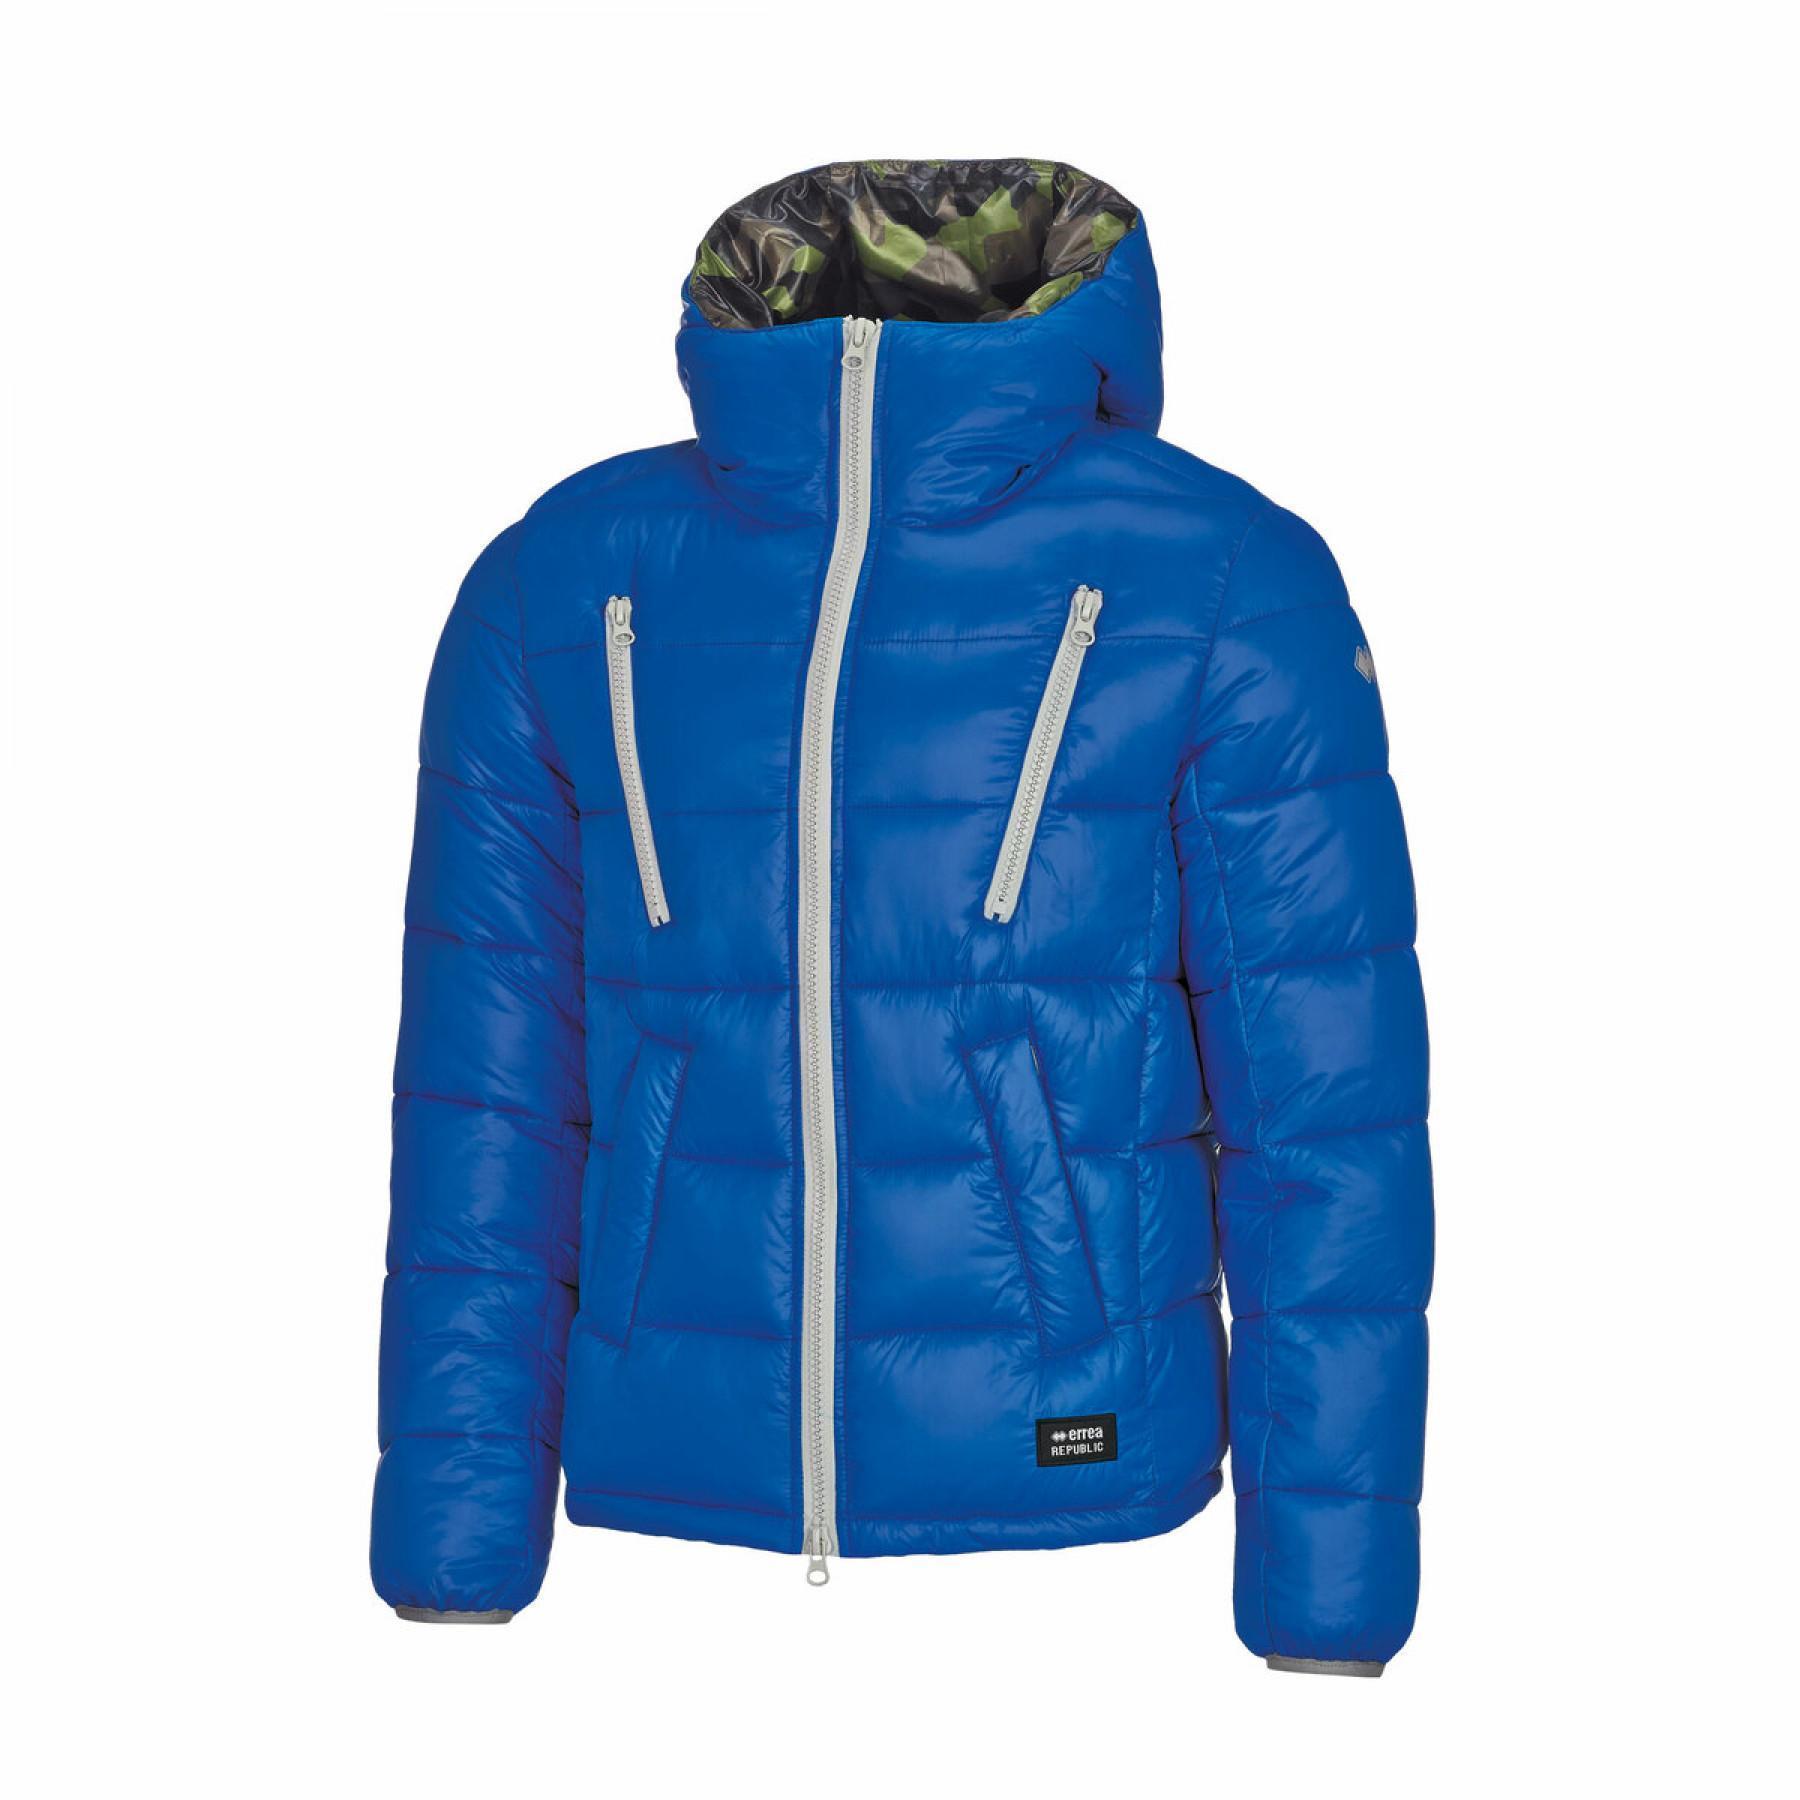 Jacket Errea hybrid quilted